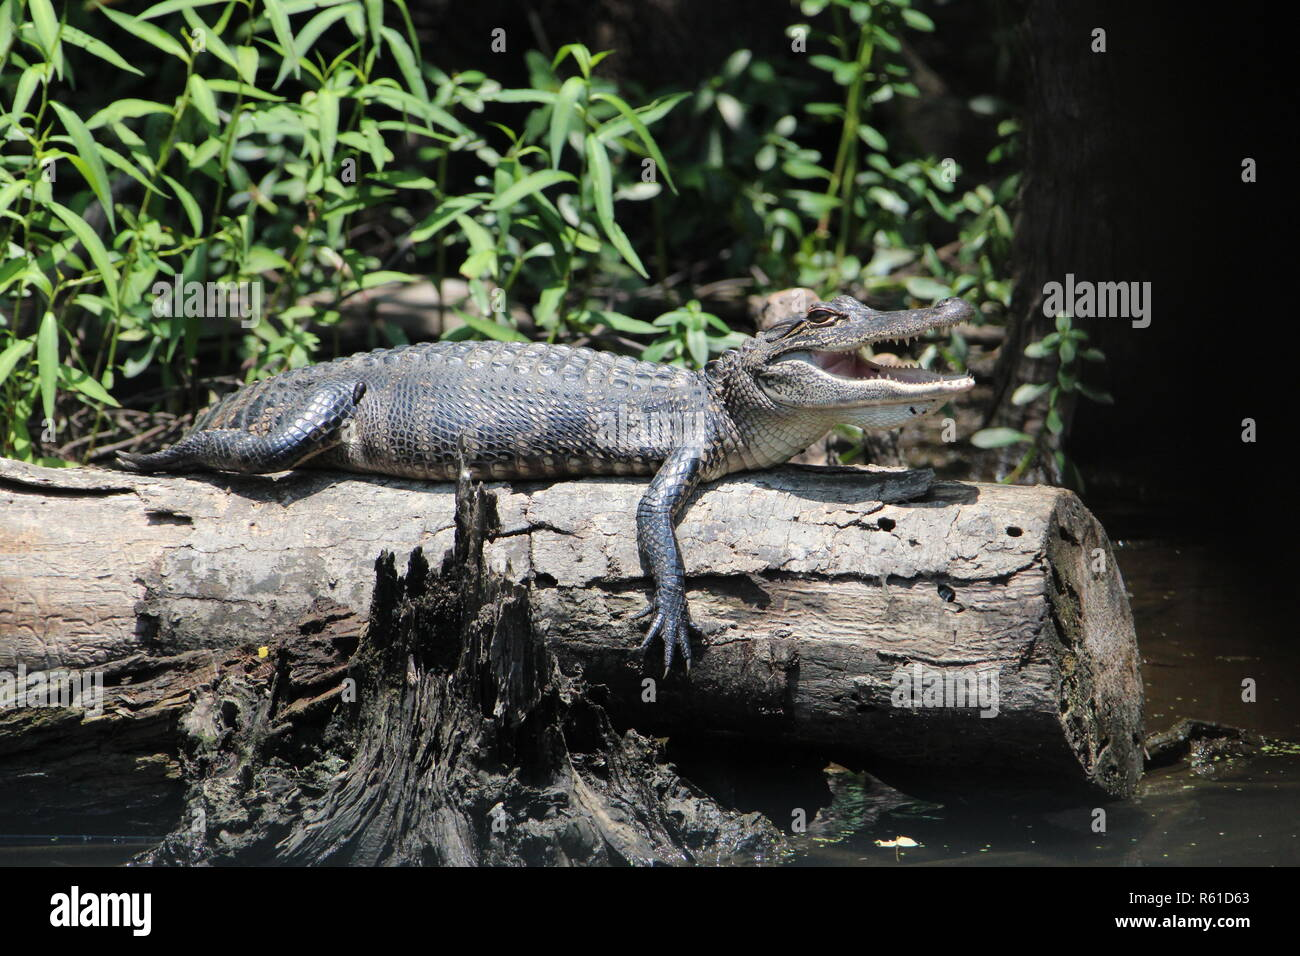 mississippi alligator sunbathes on a tree stump - Stock Image